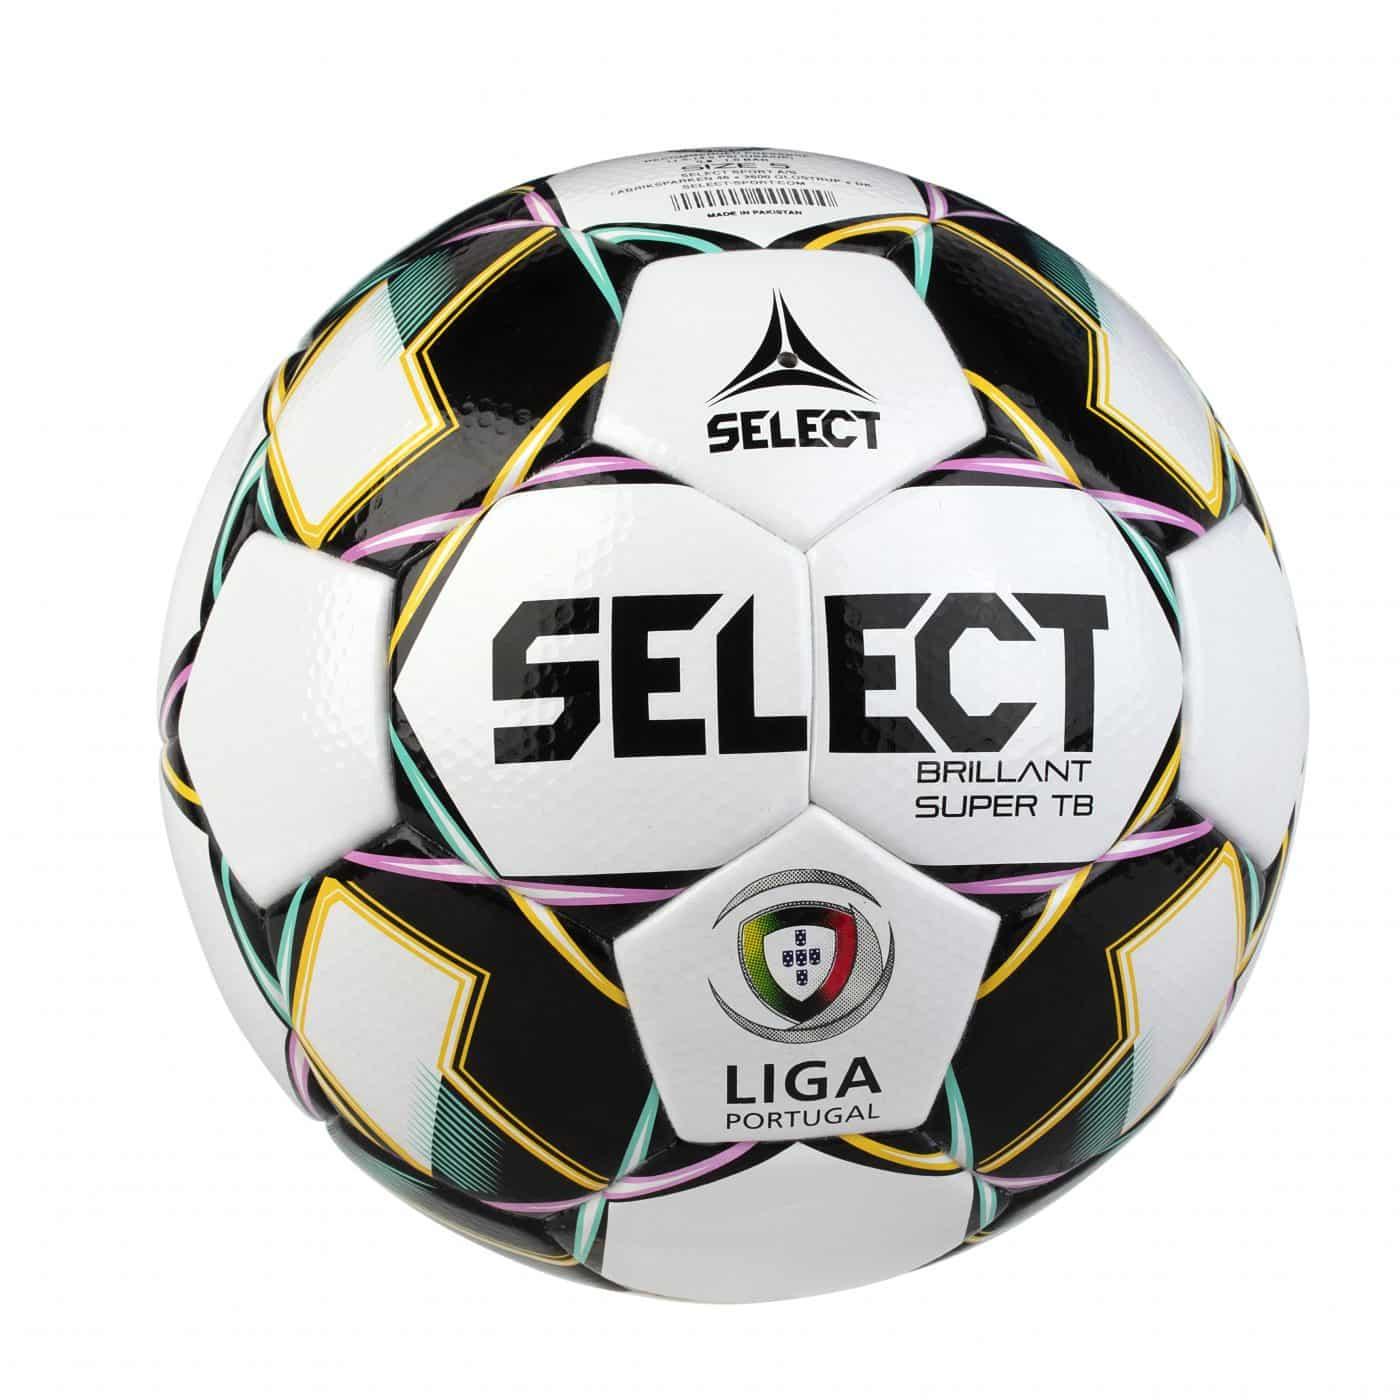 ballon-officiel-liga-nos-championnat-portugal-2020-2021-select-2